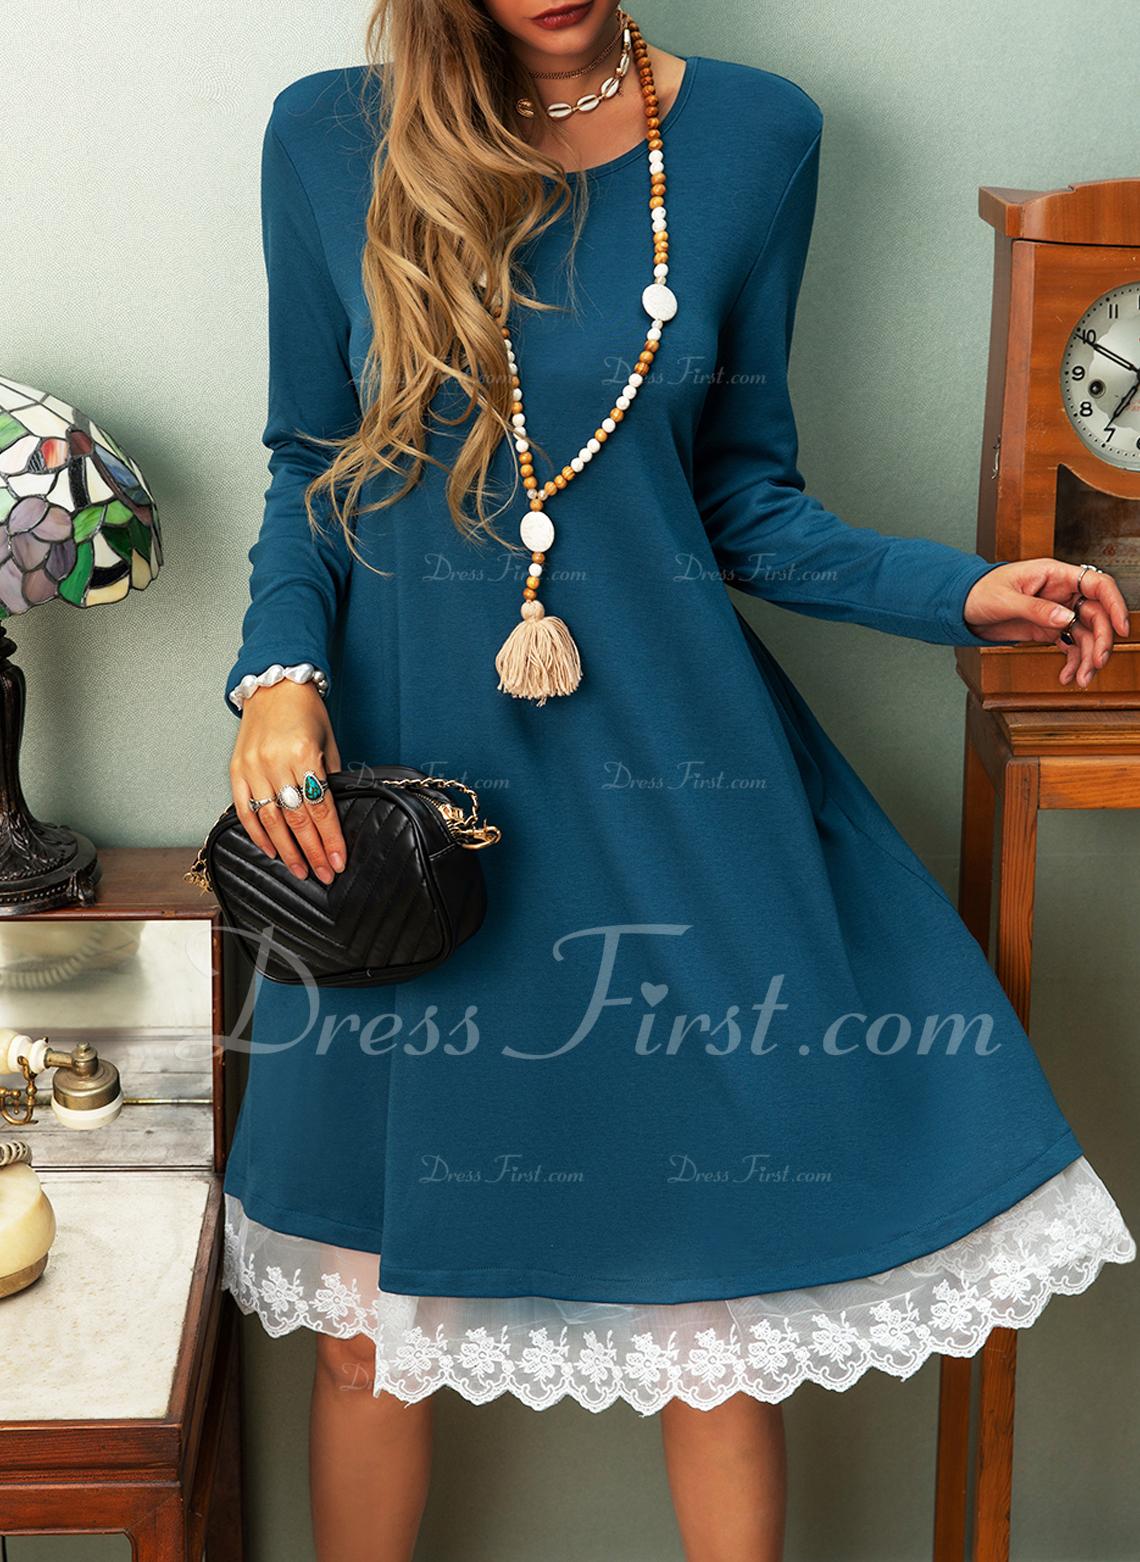 Lace Solid Shift Long Sleeves Midi Casual Vacation T-shirt Dresses